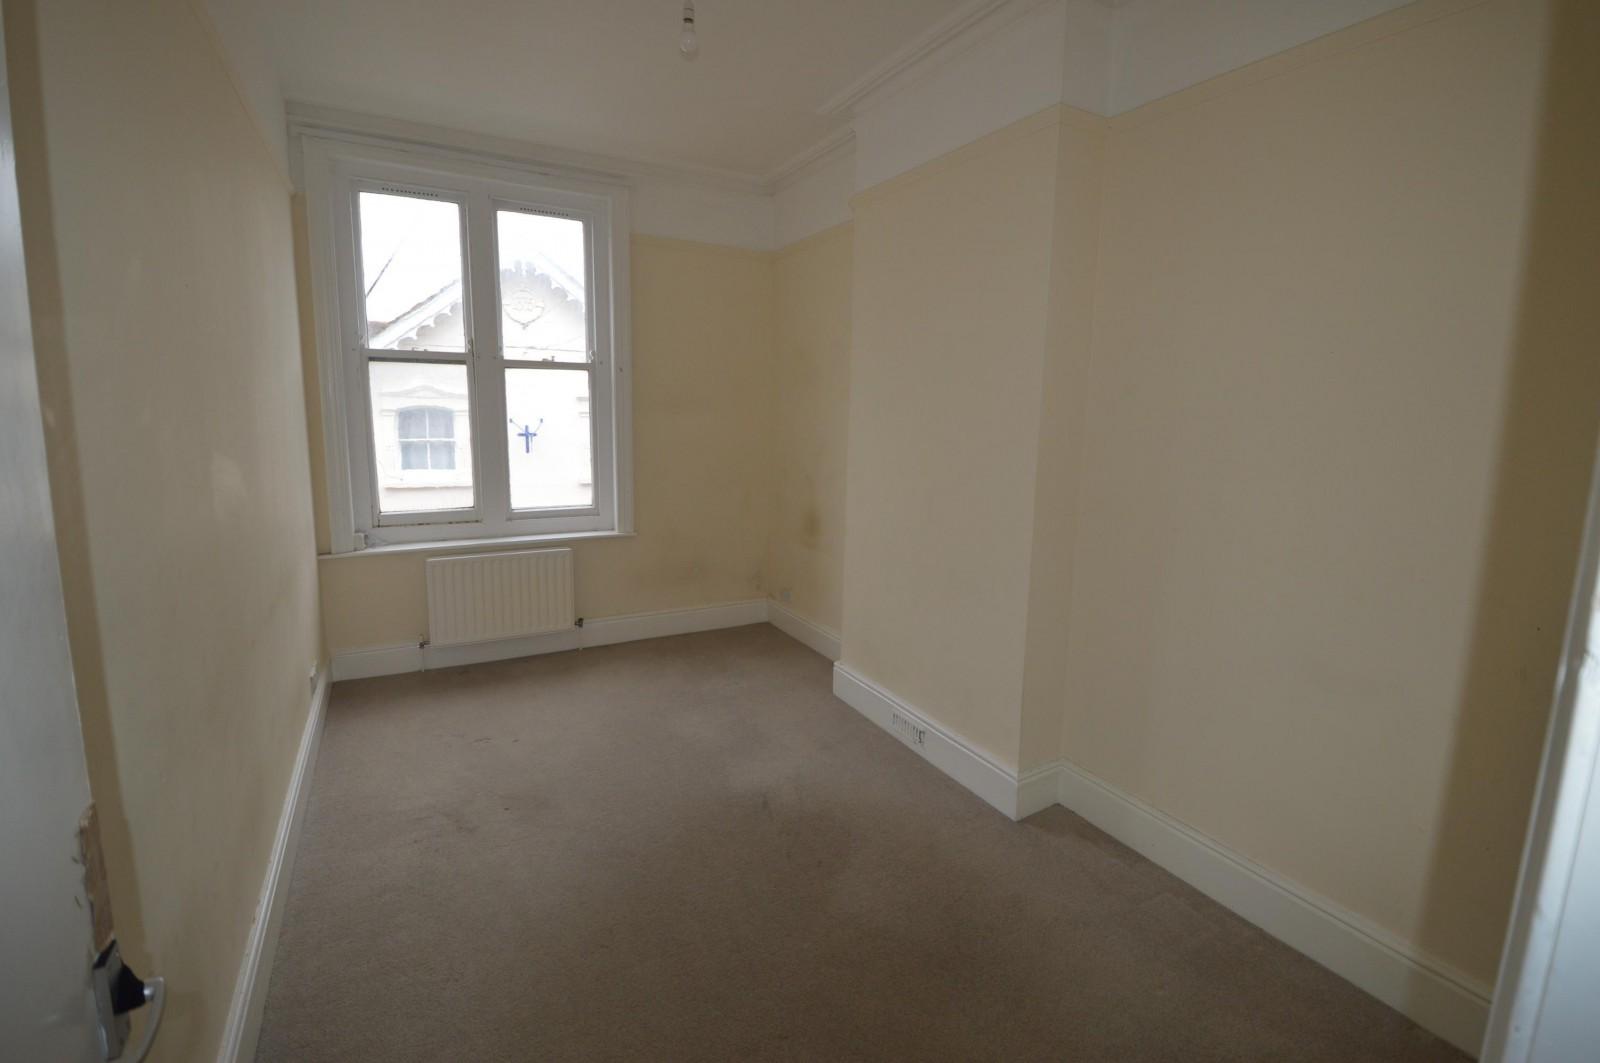 Bedroom 1 Property to let in Petersfield